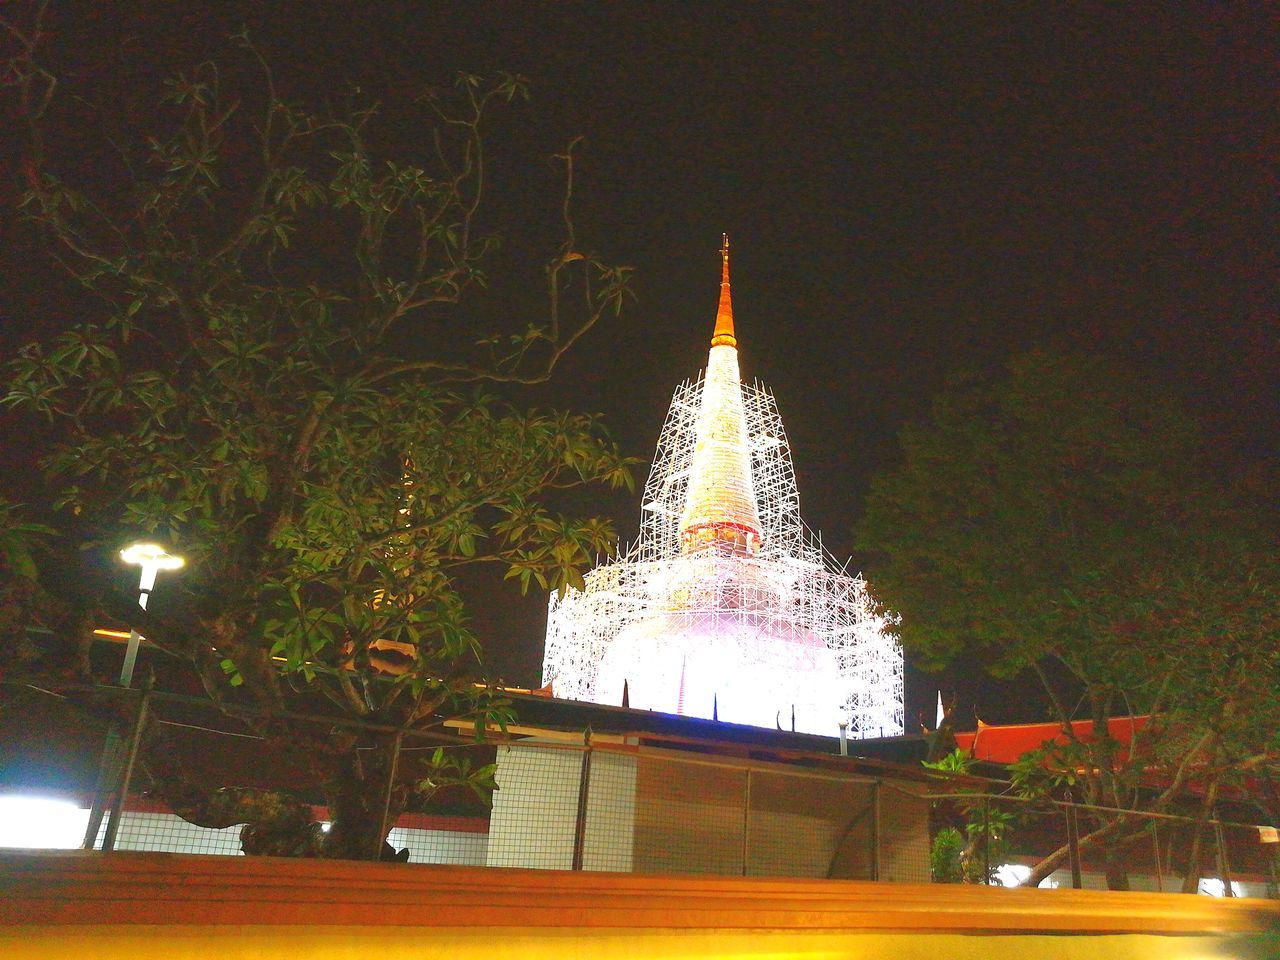 Pra ma ha tart. Nakhon Si Thammarat Night Light Bulb Outdoors No People Tree